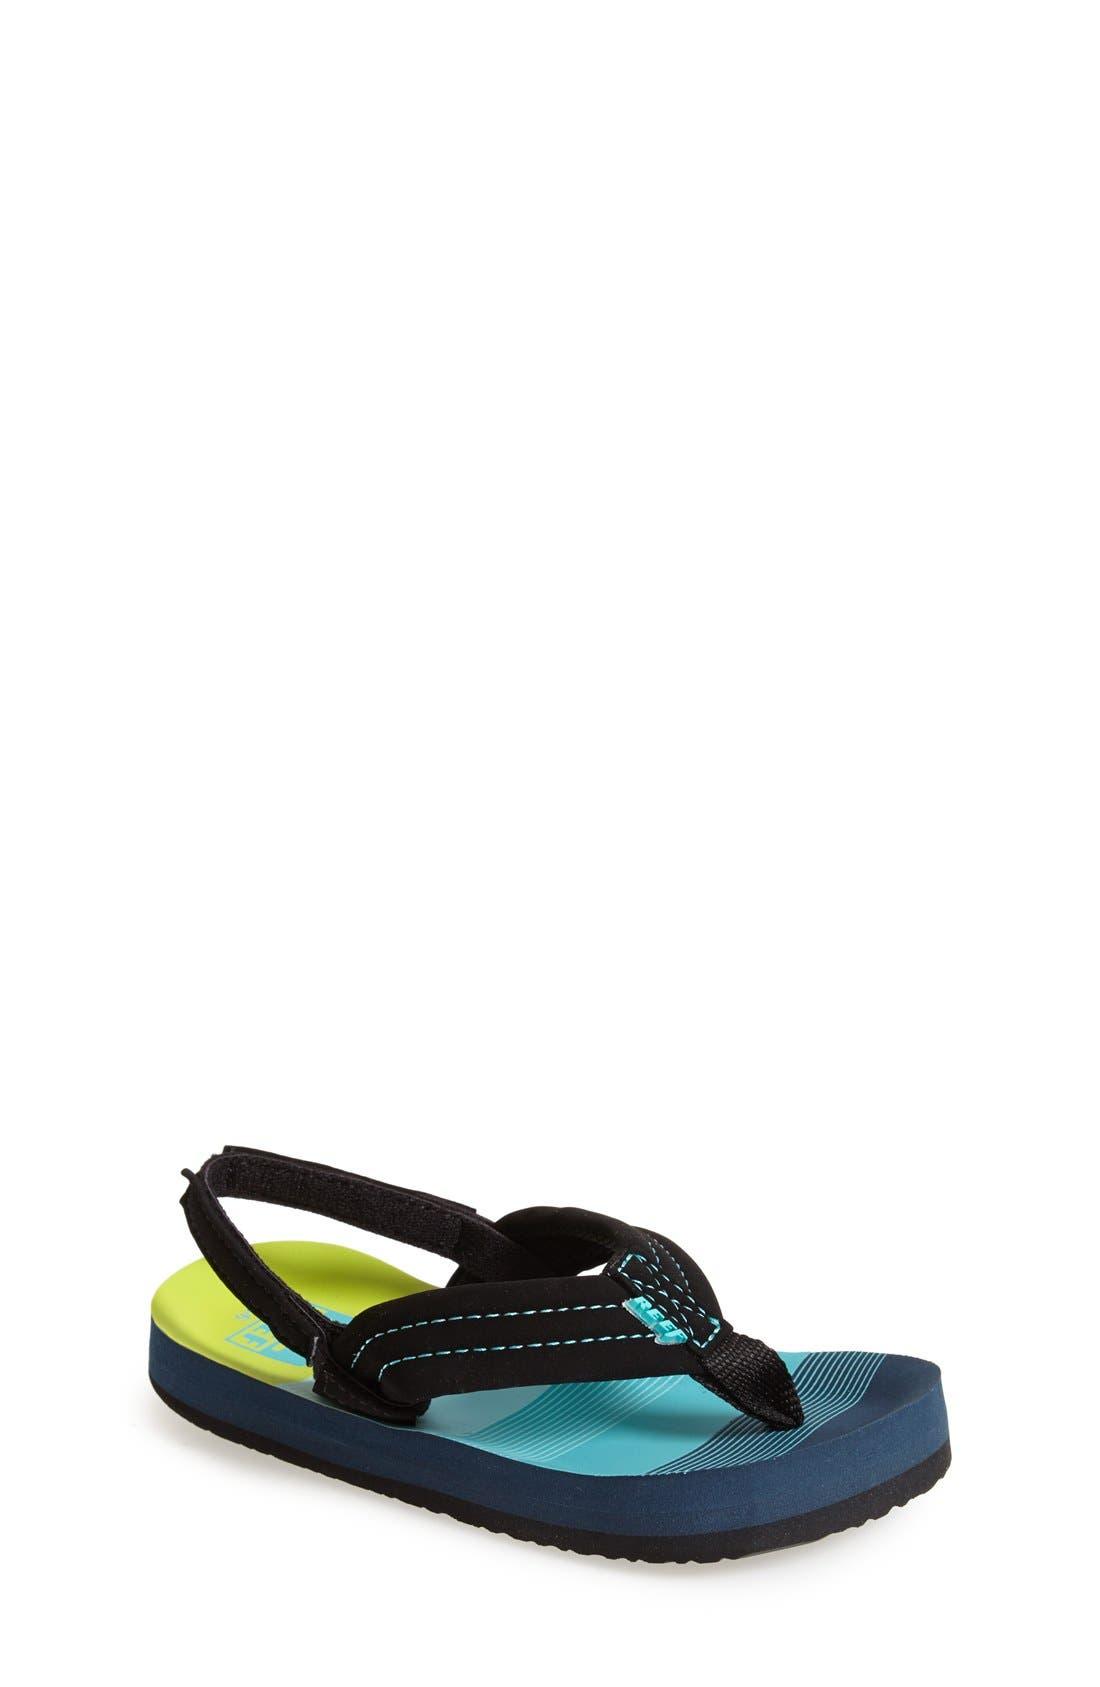 REEF 'Ahi - Stripes' Sandal, Main, color, AQUA/ GREEN